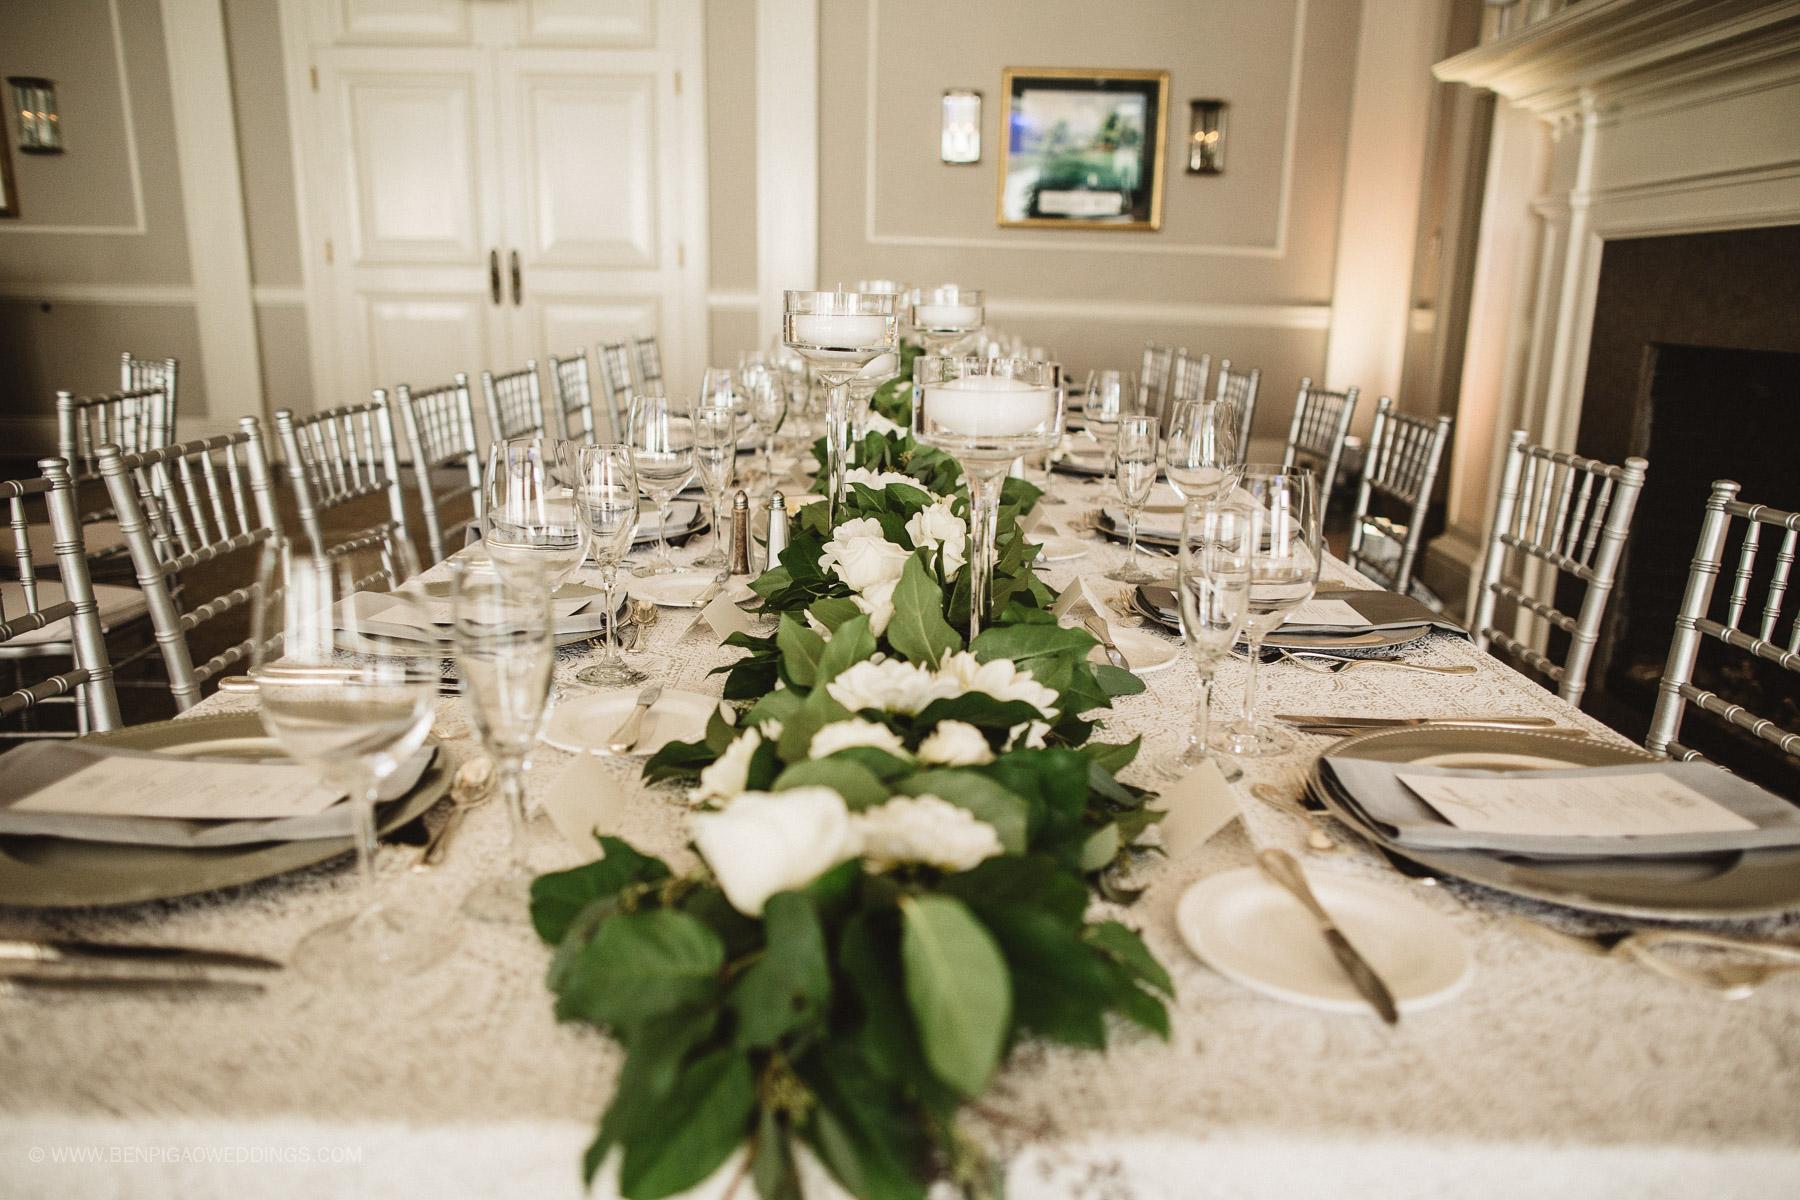 Gorgeous Simple Wedding Centerpieces - Portland, Oregon Waverley Country Club Wedding